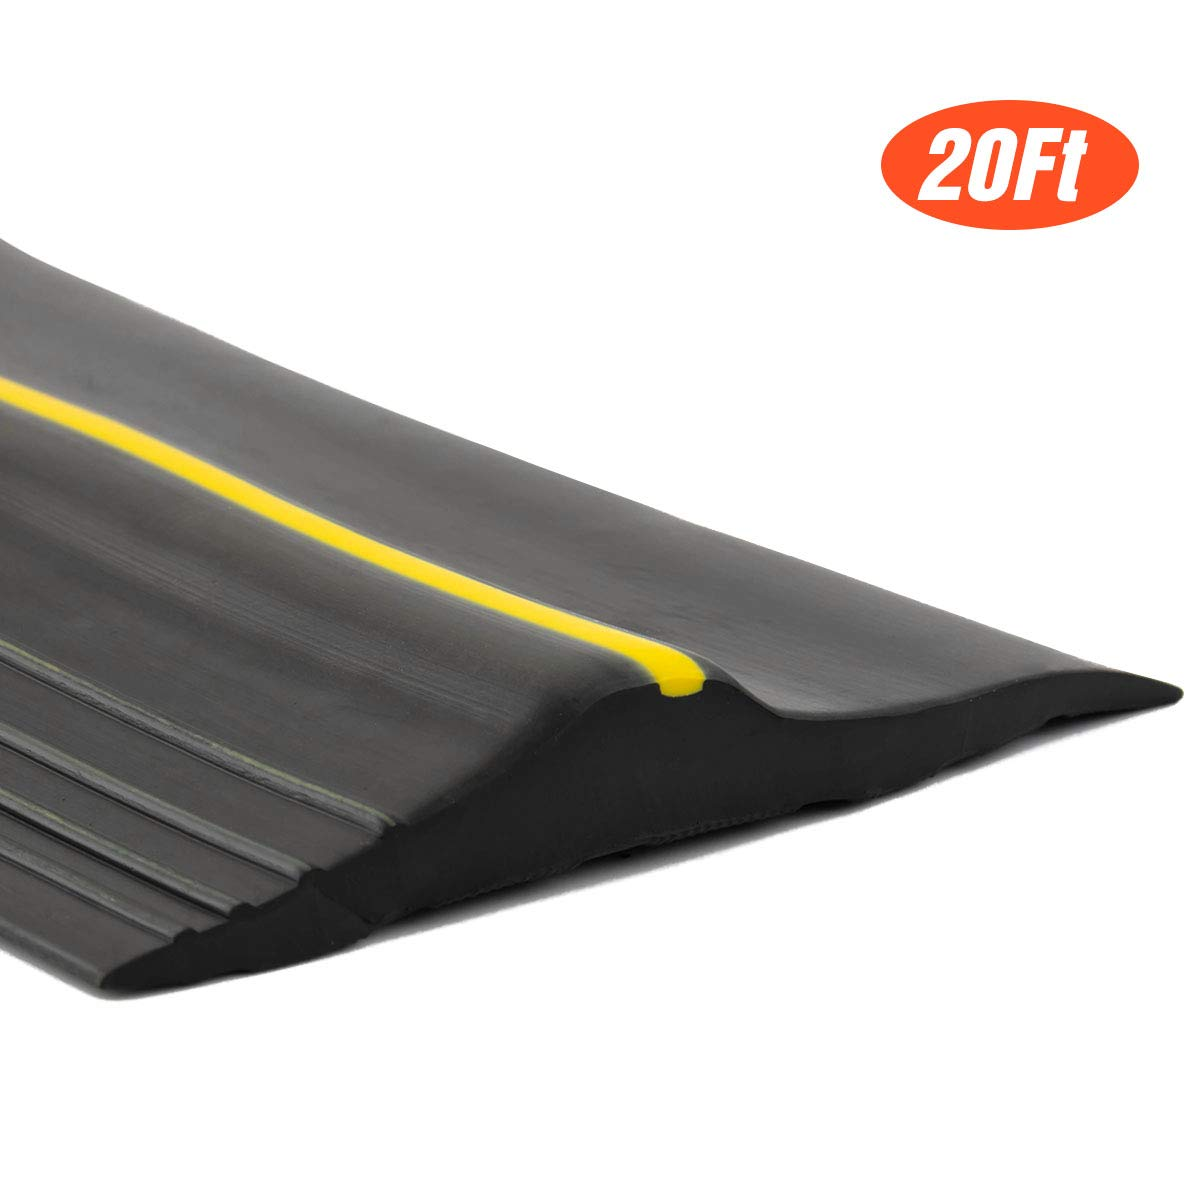 20Ft/6M Universal Garage Threshold Seal Strip, Garage Door Bottom Weatherproof Strip Rubber DIY Weather Stripping Replacement, Not Include Sealant/Adhesive (Black) by ToLanbbt